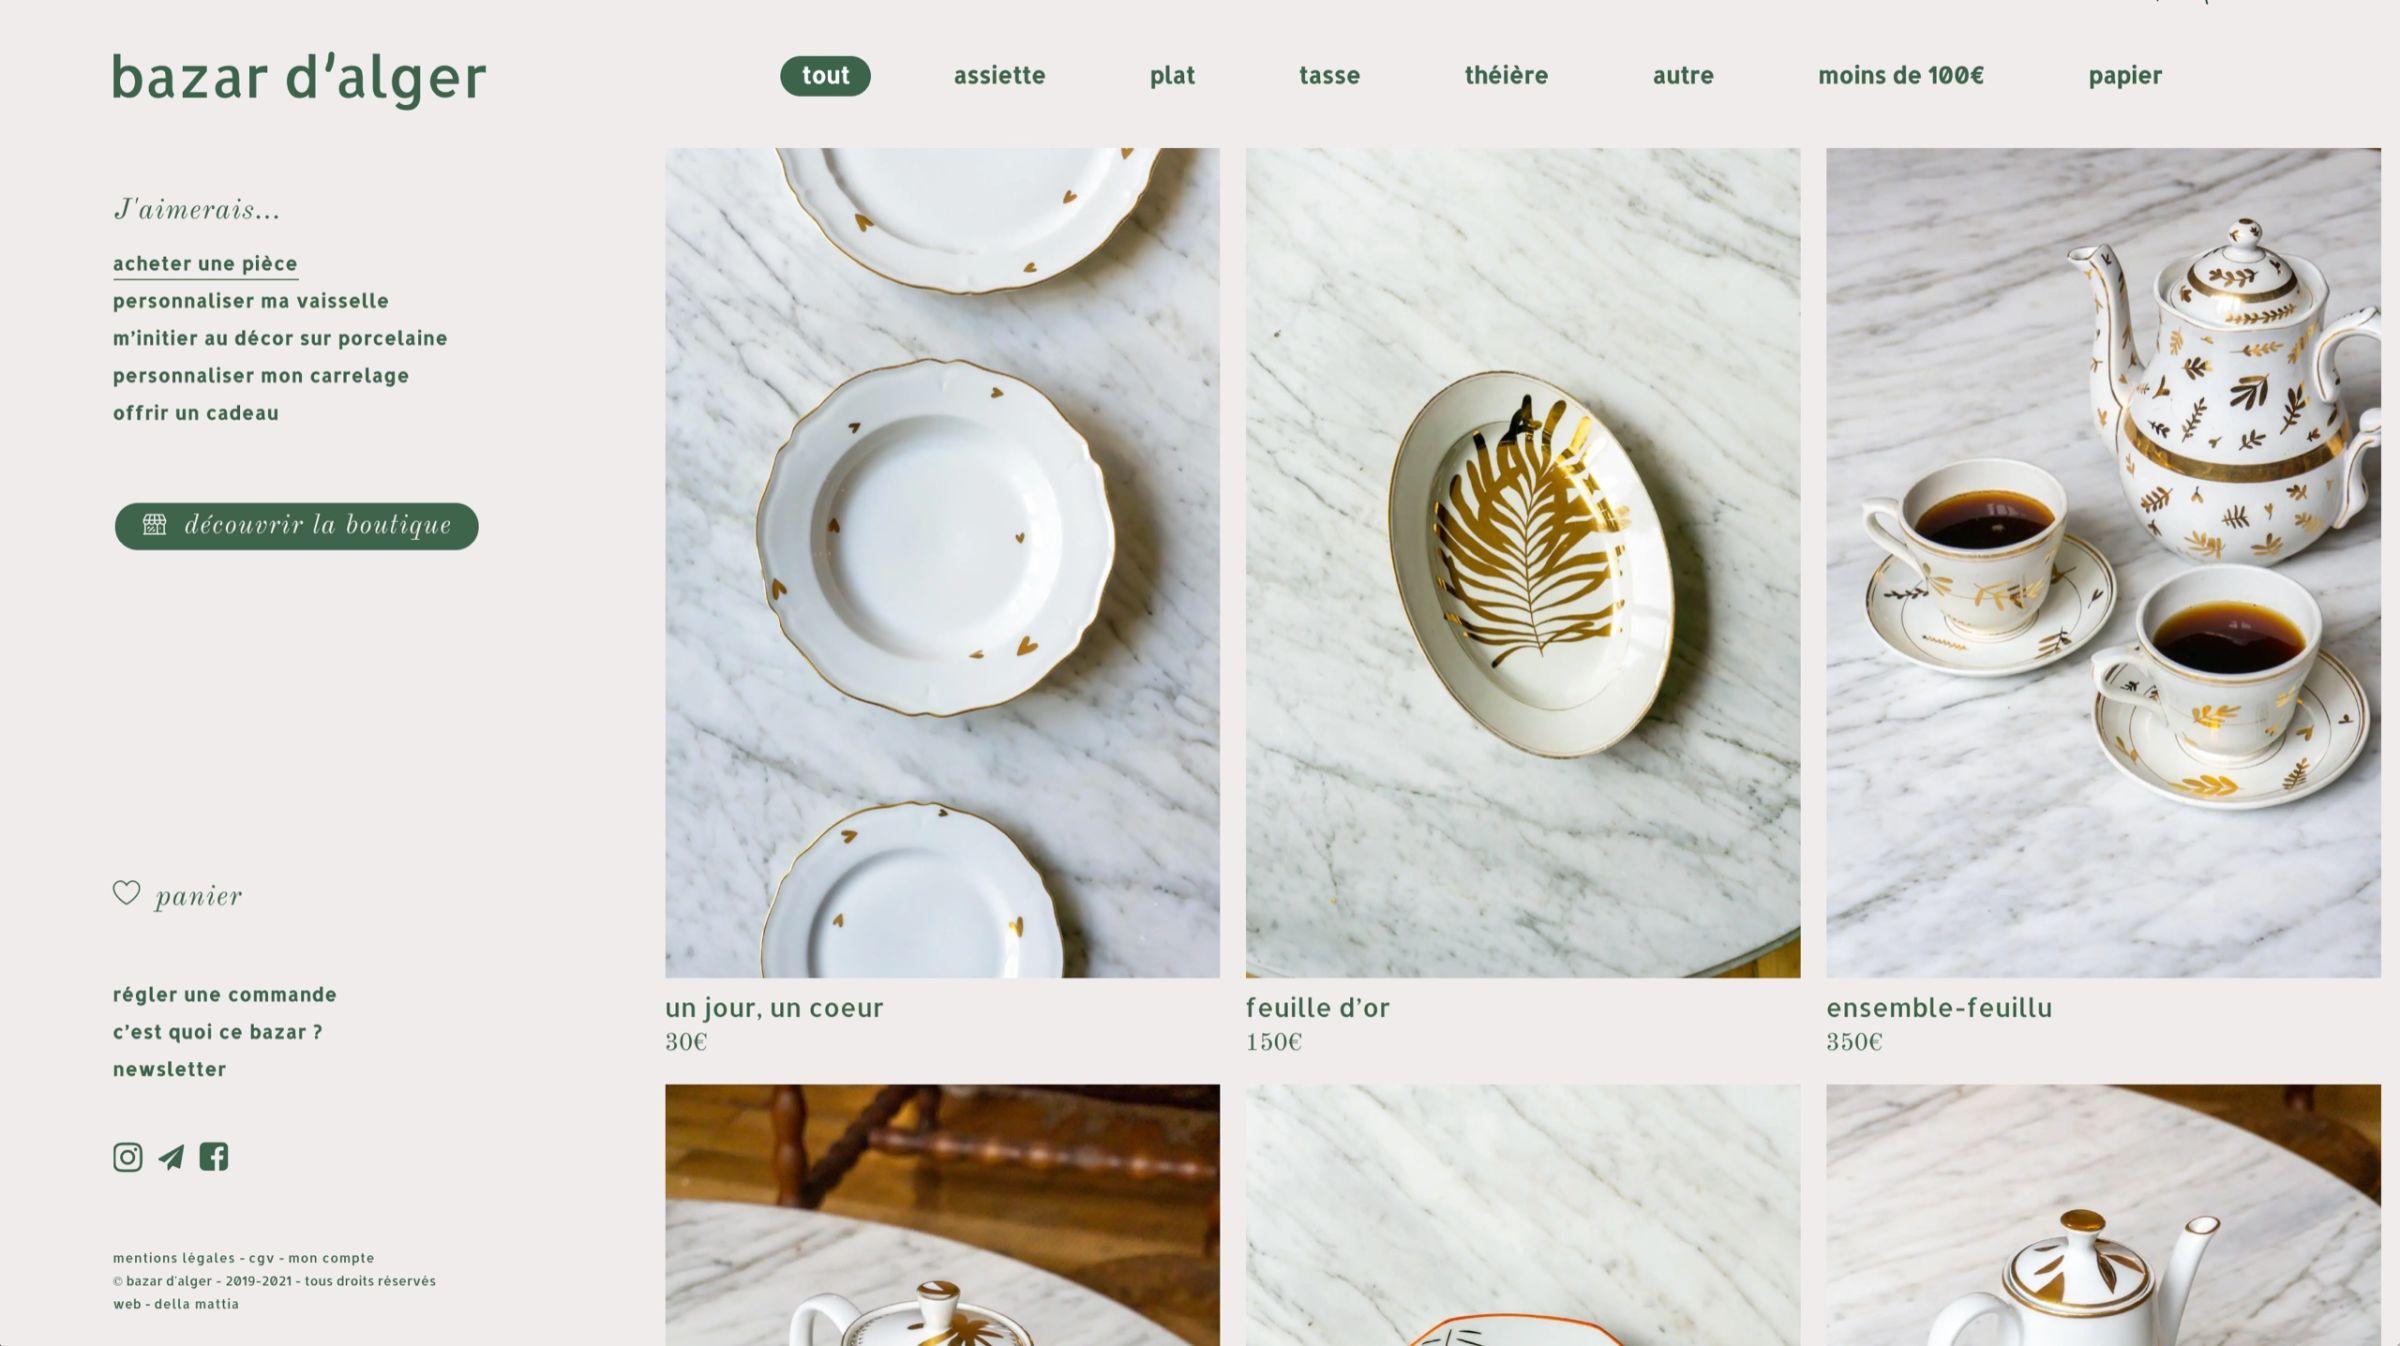 bazar-dalger-website-screenshot